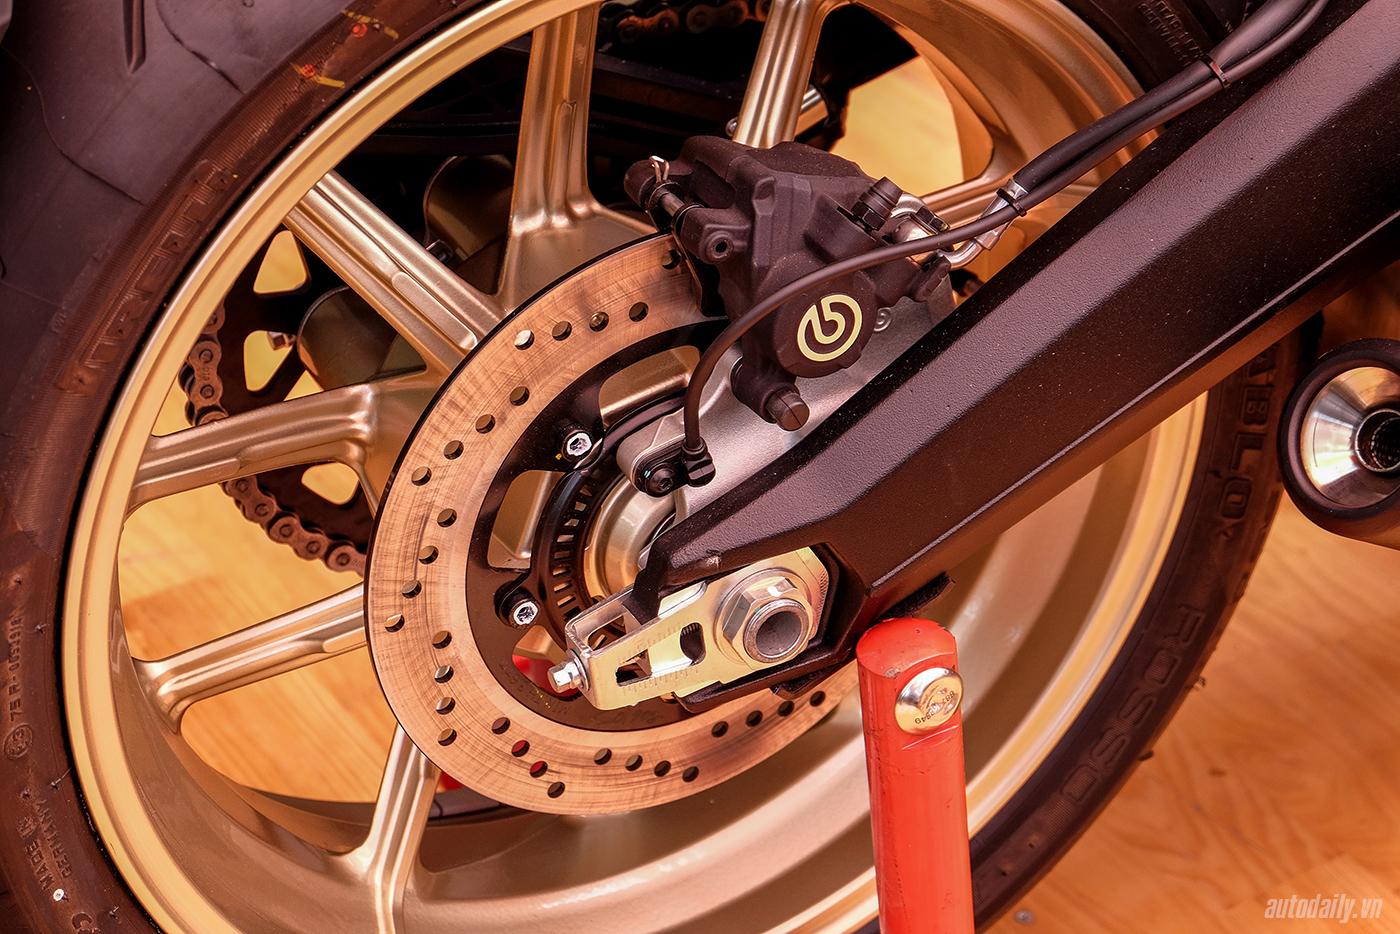 ducati-scrambler-cafe-racer-36.jpg